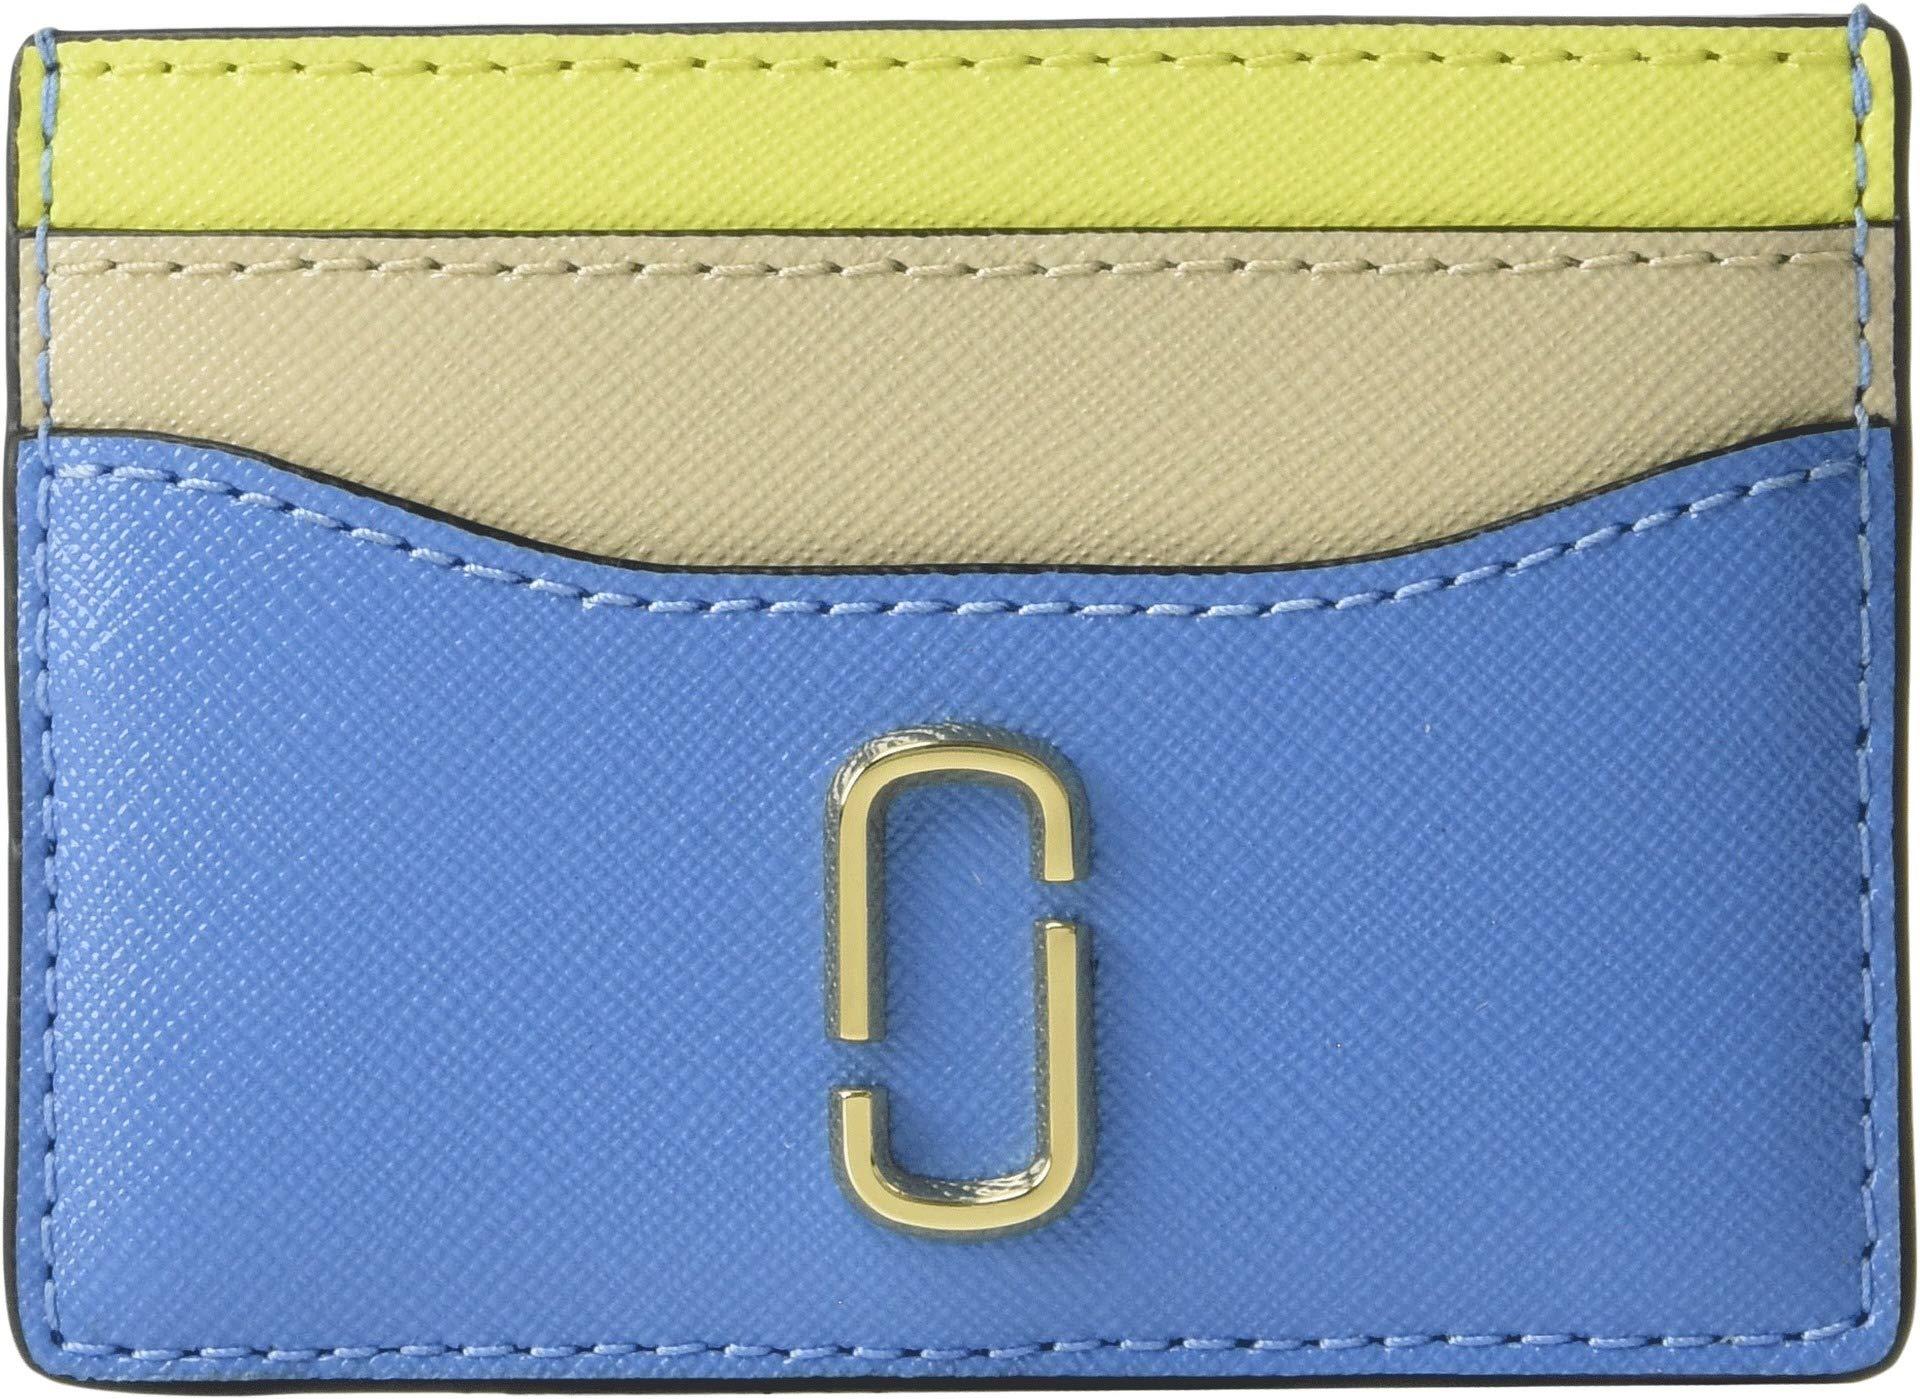 Marc Jacobs Women's Snapshot Card Case, Aquaria Multi, One Size